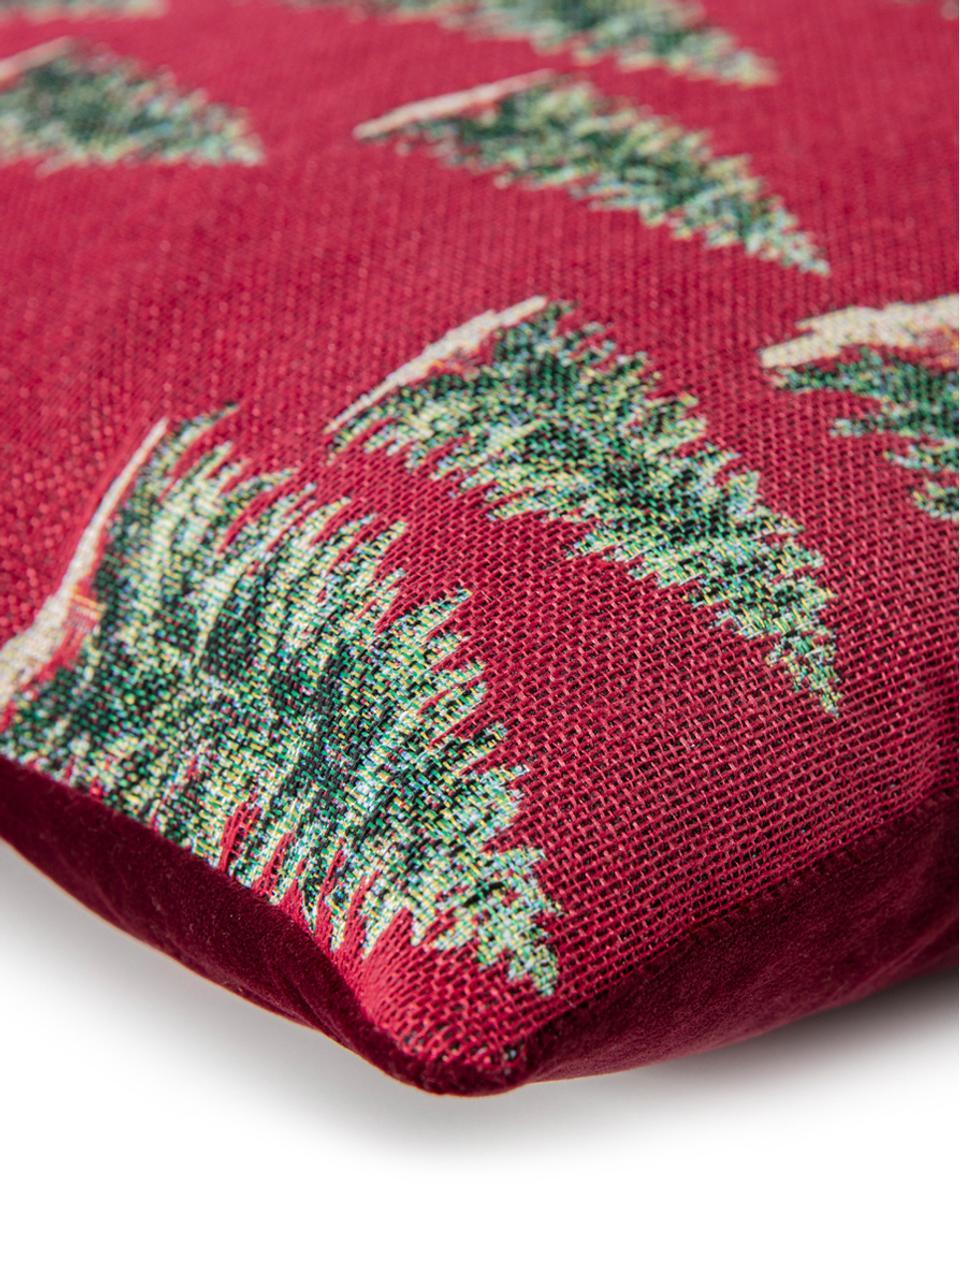 Funda de cojín Pinetree, Parte superior: 55%poliéster, 45%algodó, Parte trasera: terciopelo de poliéster, Rojo, verde, beige, An 40 x L 40 cm